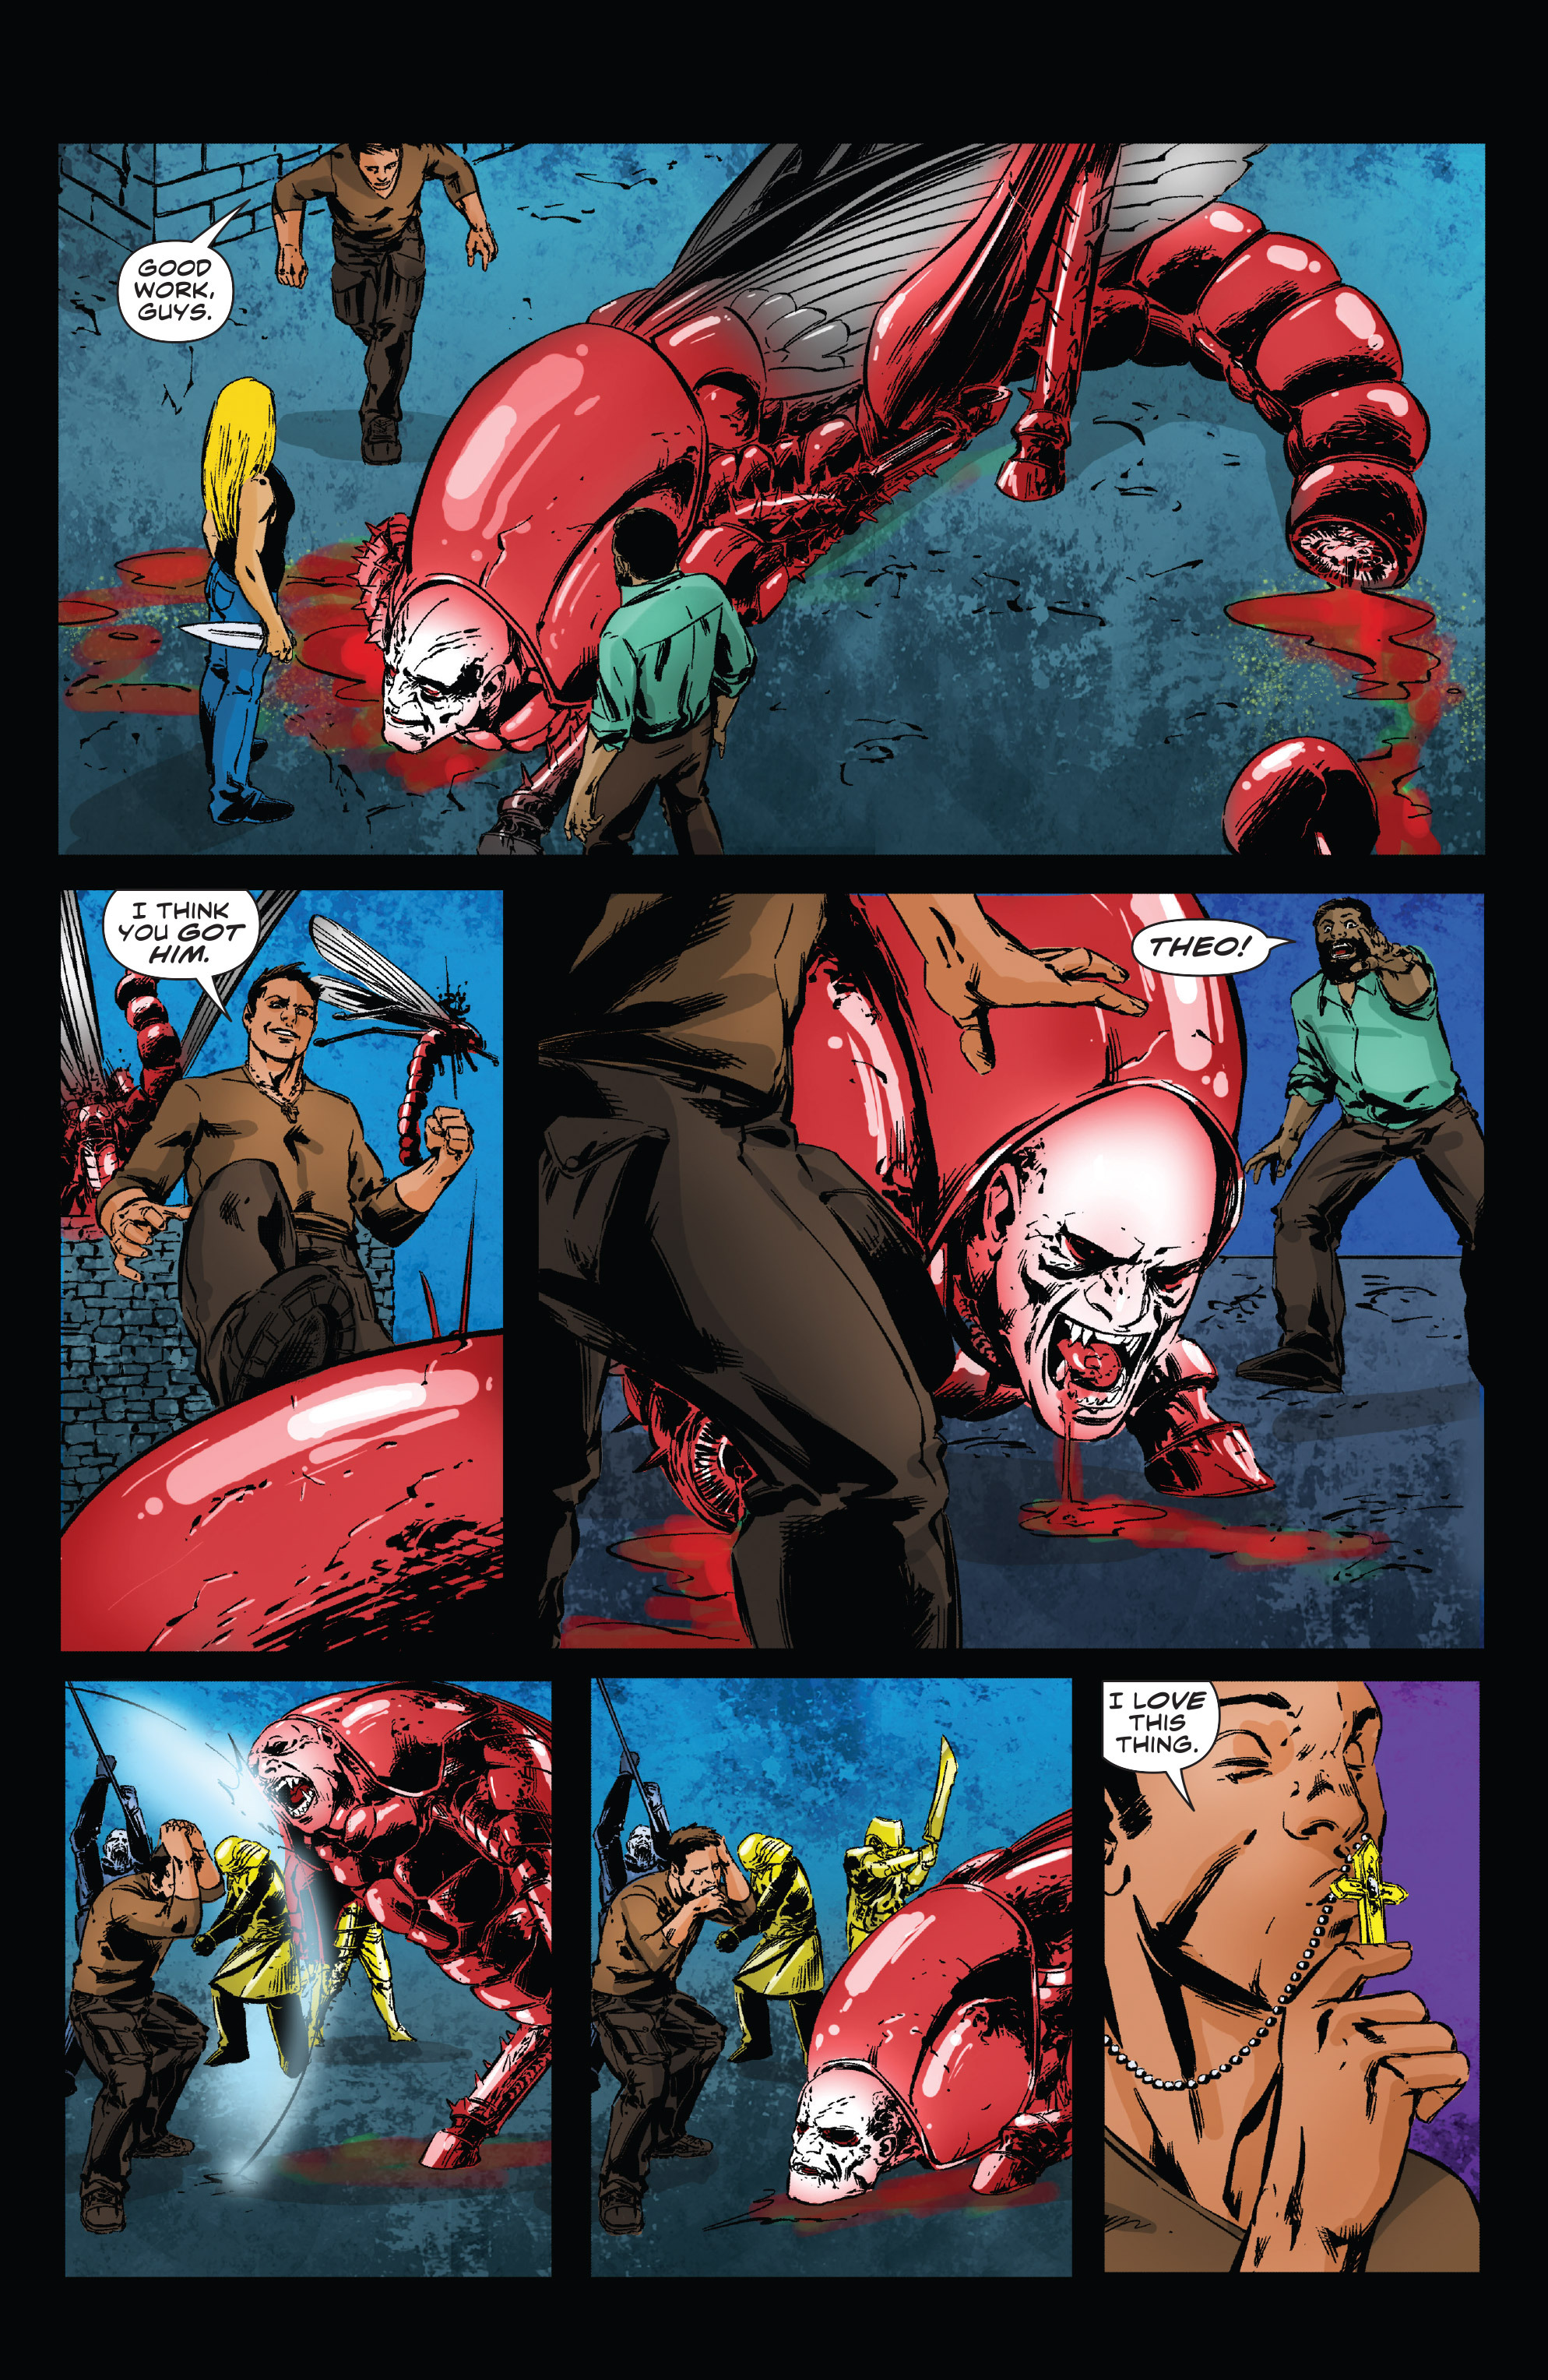 Read online Clive Barker's Hellraiser: The Dark Watch comic -  Issue # TPB 3 - 54